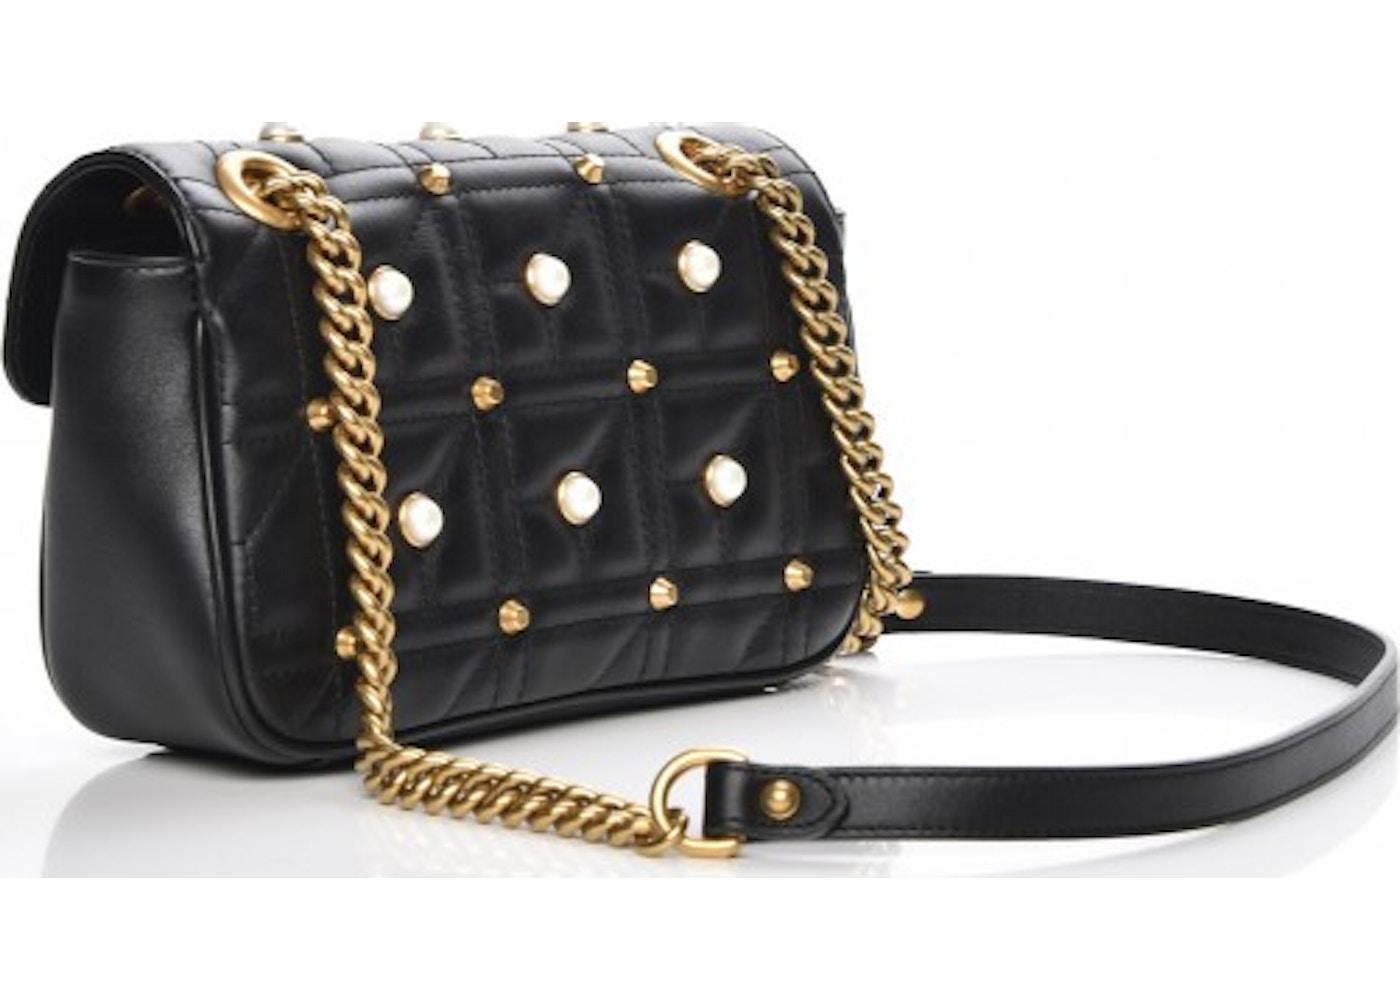 e28f8c83a2bdbe Gucci Marmont Shoulder Bag Matelasse Pearl Studded Mini Black